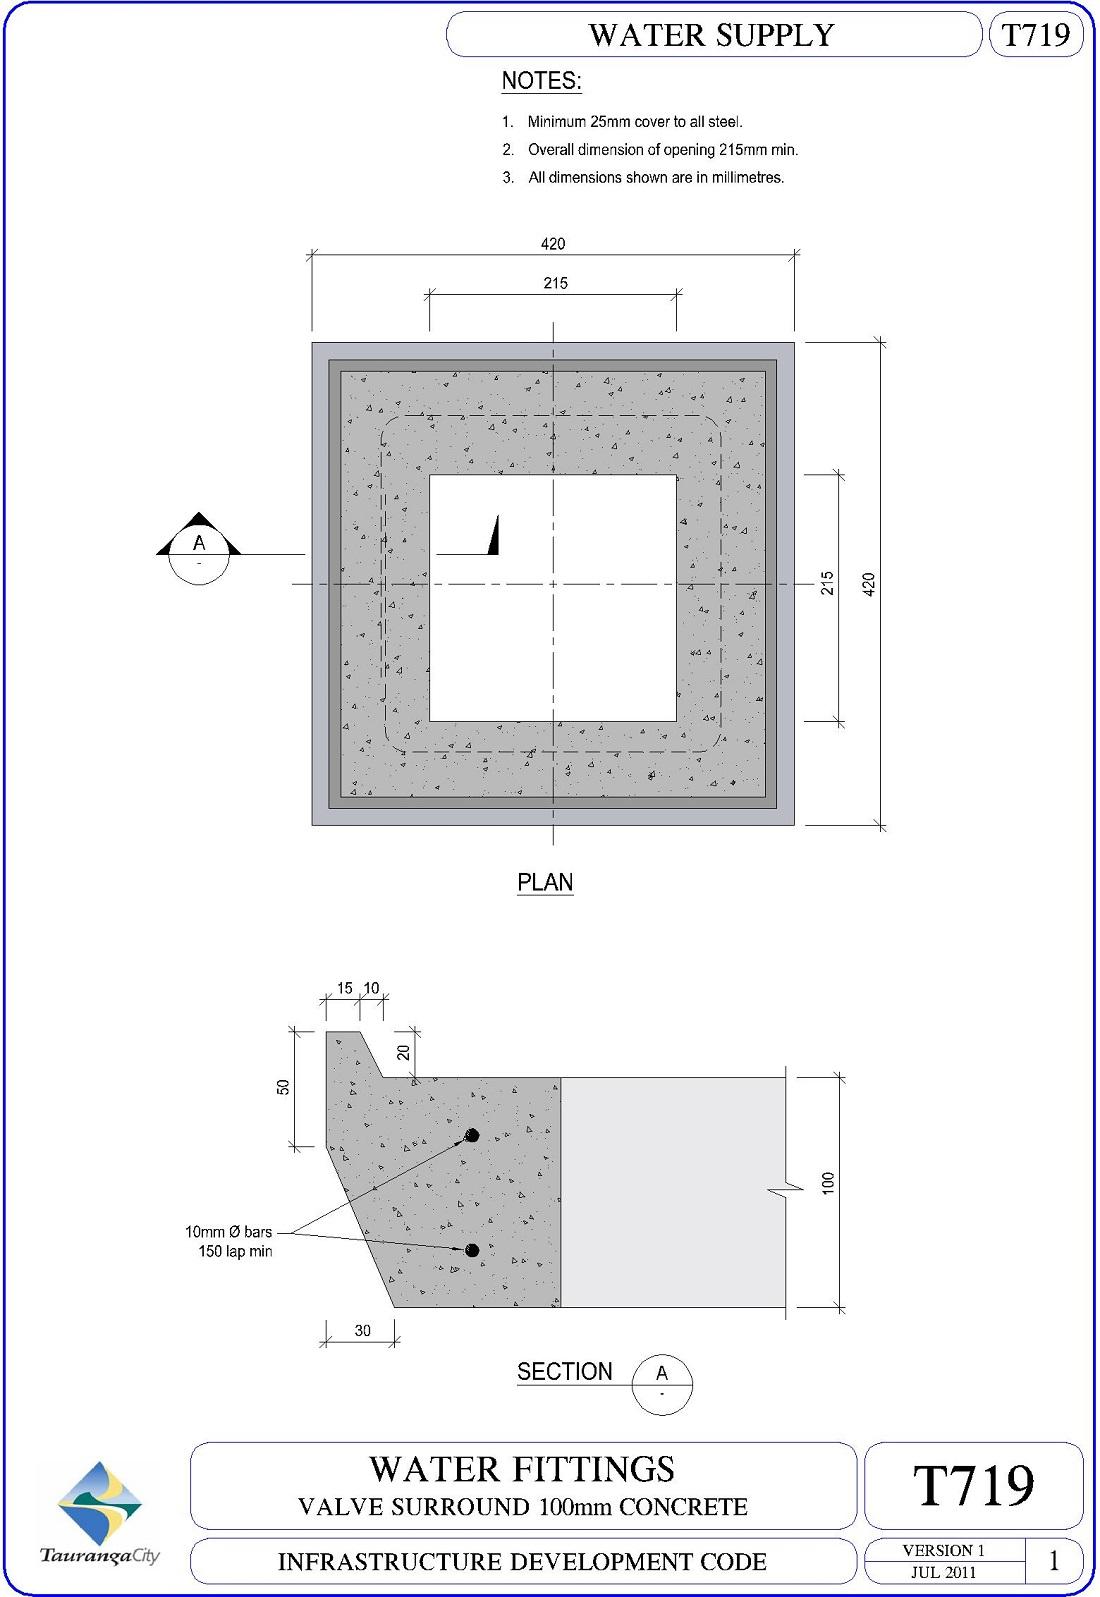 Valve Surround 100mm Concrete